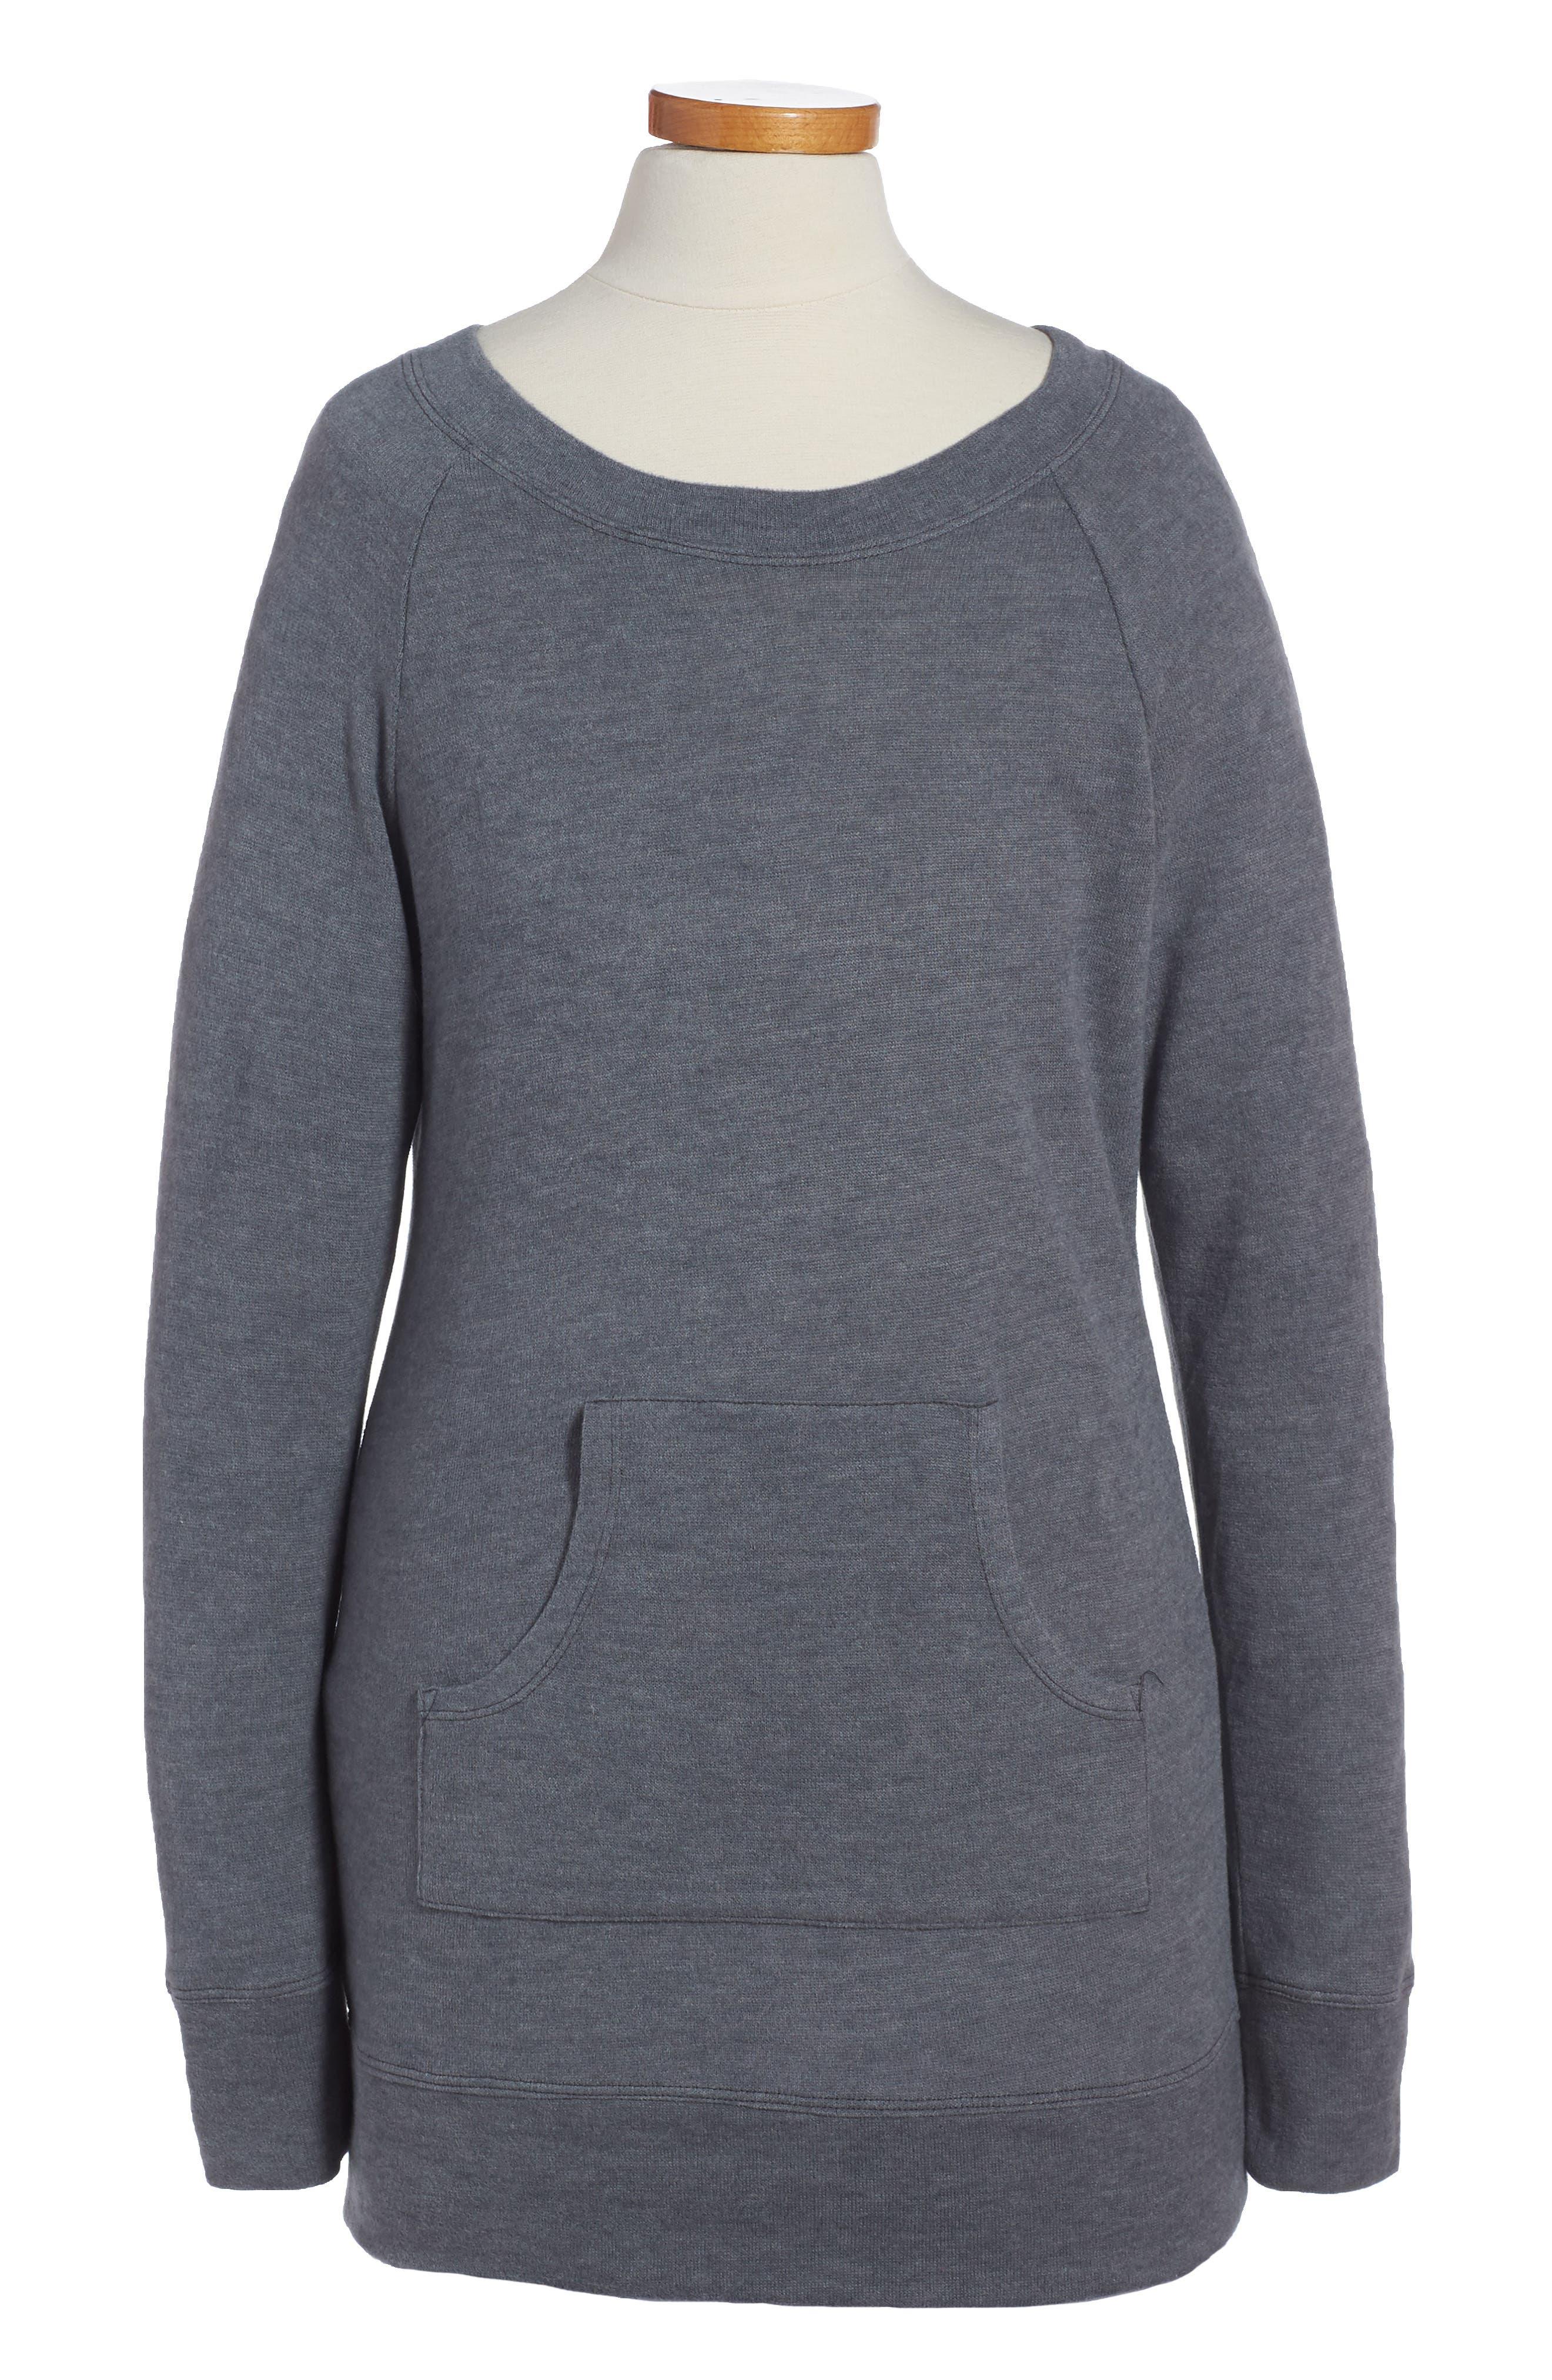 Sweatshirt Dress,                         Main,                         color, Grey